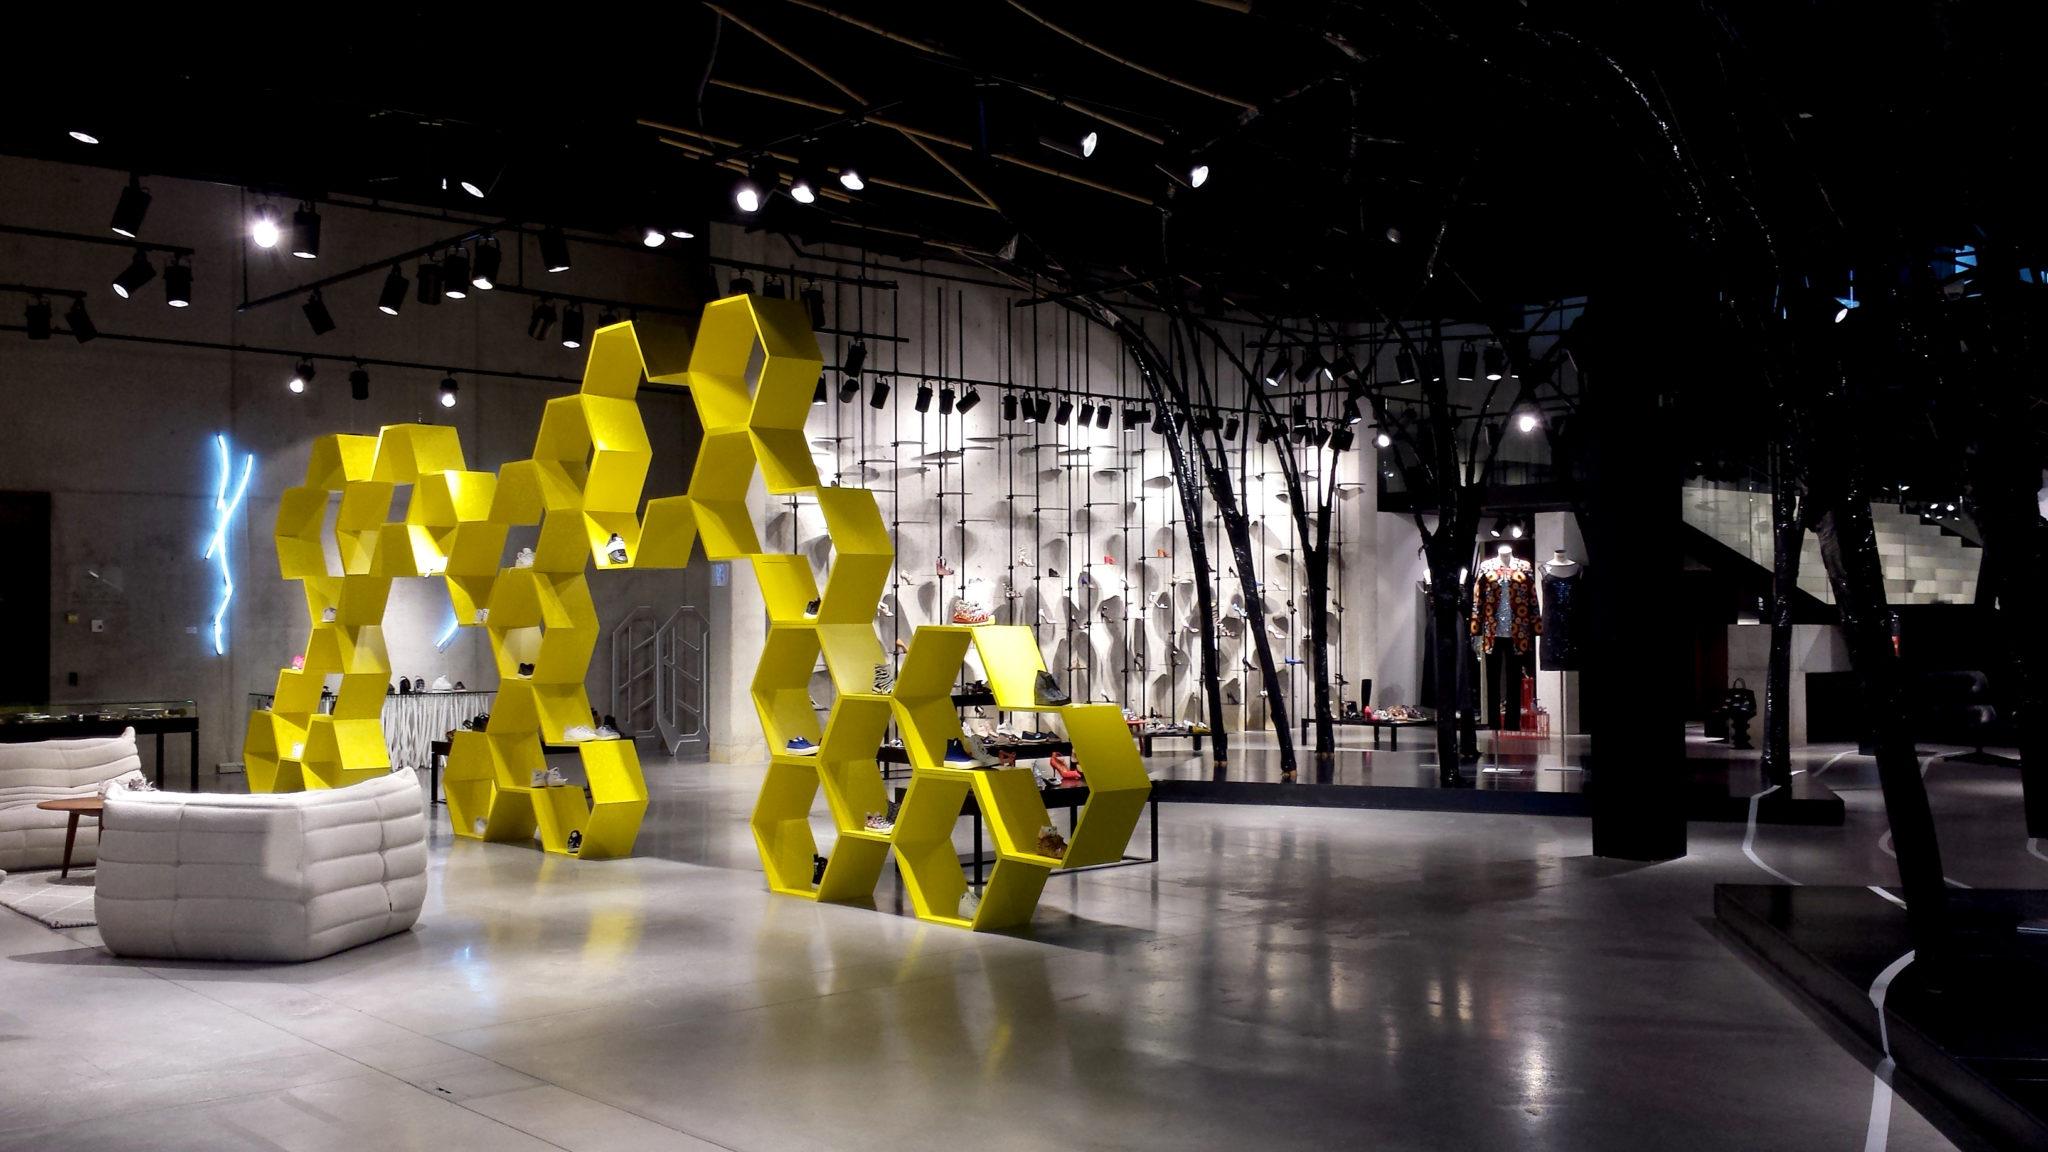 Hema_Bruxelles_bonnes_adresses_shopping_fashion_smets_createurs